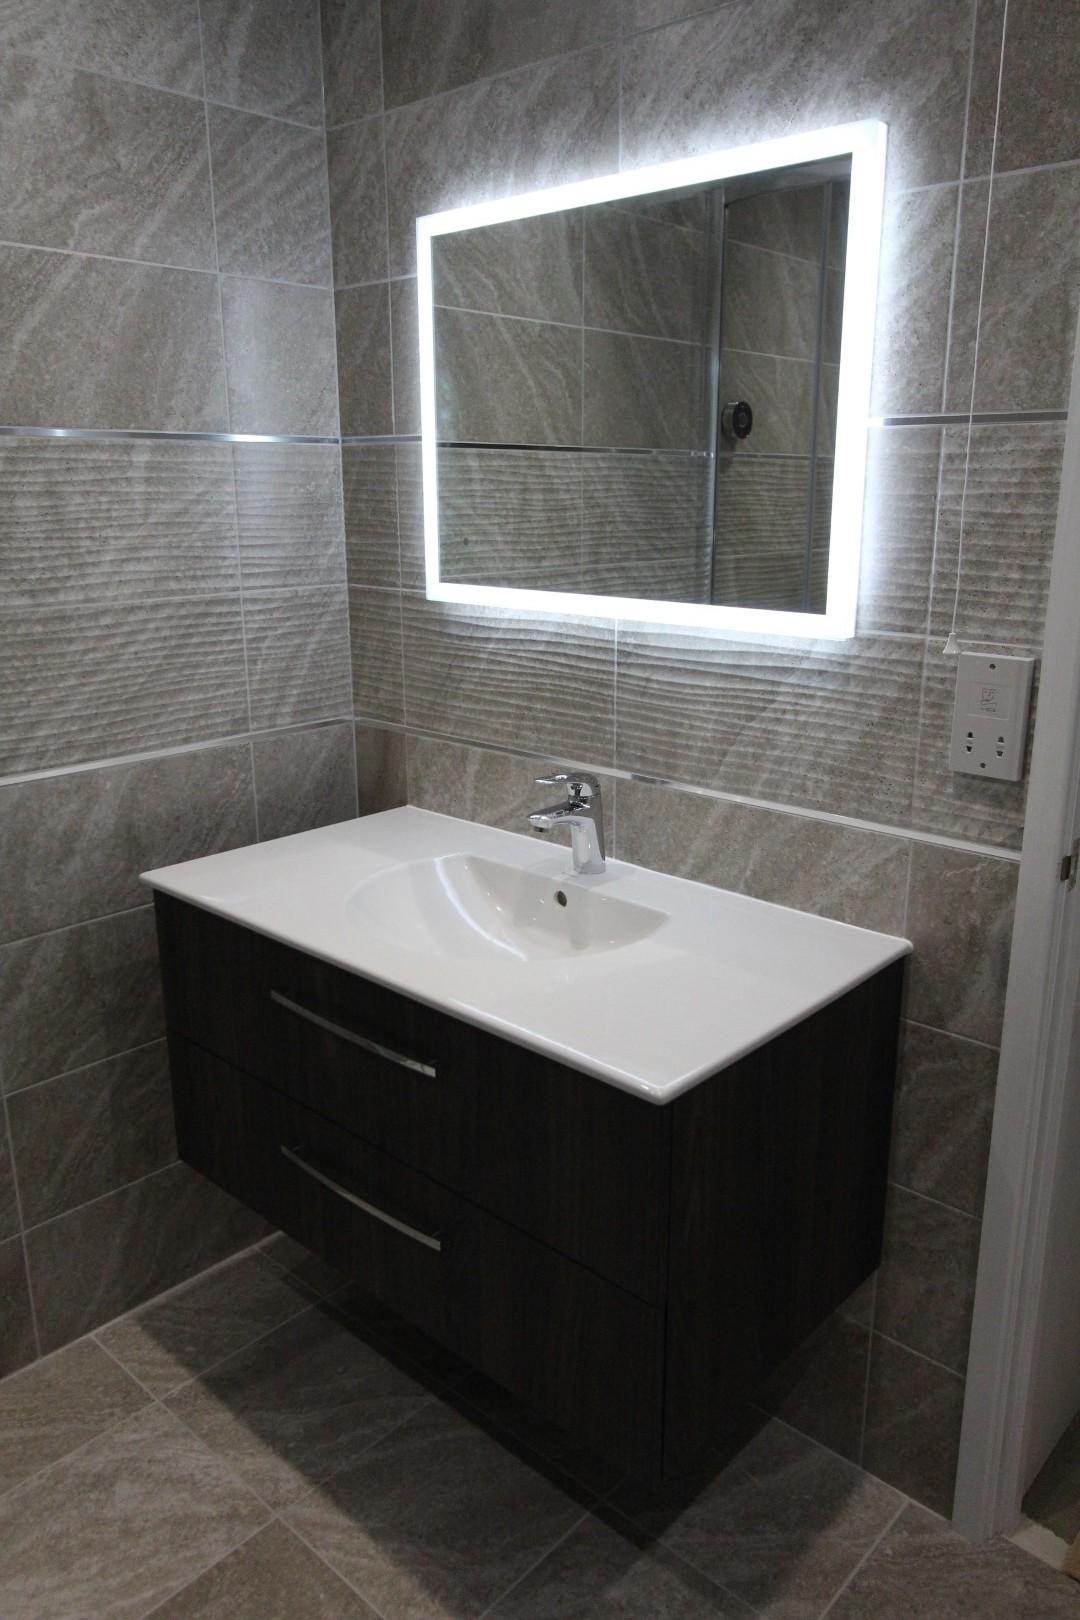 Dack Atlantic Bathrooms & Kitchens (3).jpeg